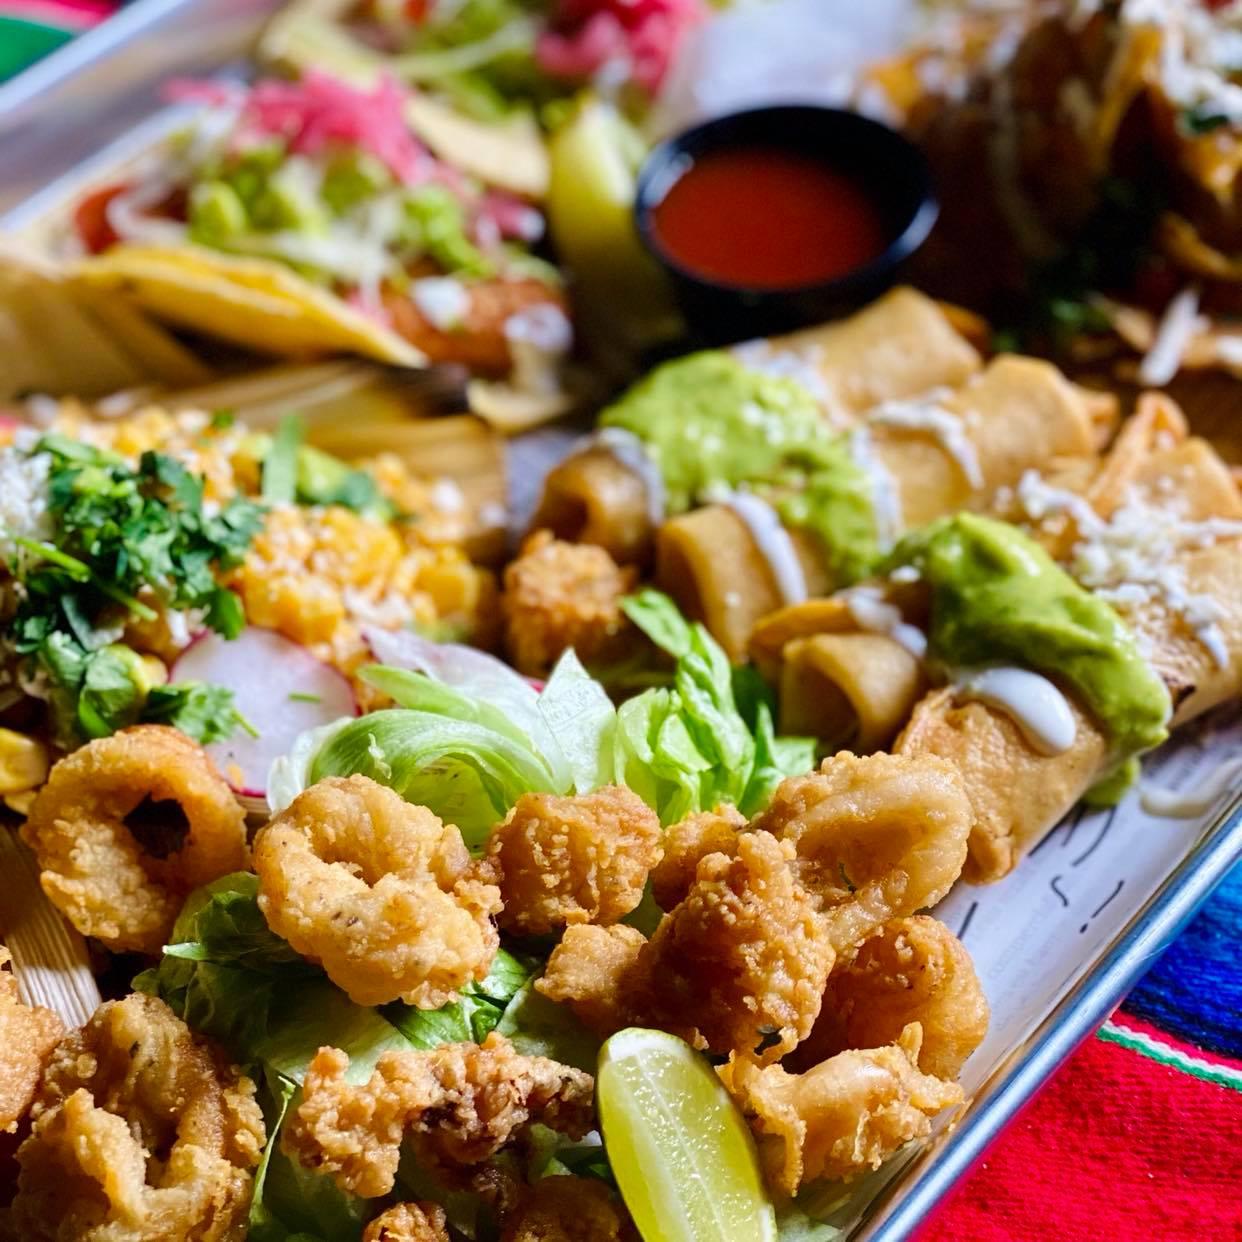 meilleur restaurant st-roch quebec - Tequila Lounge